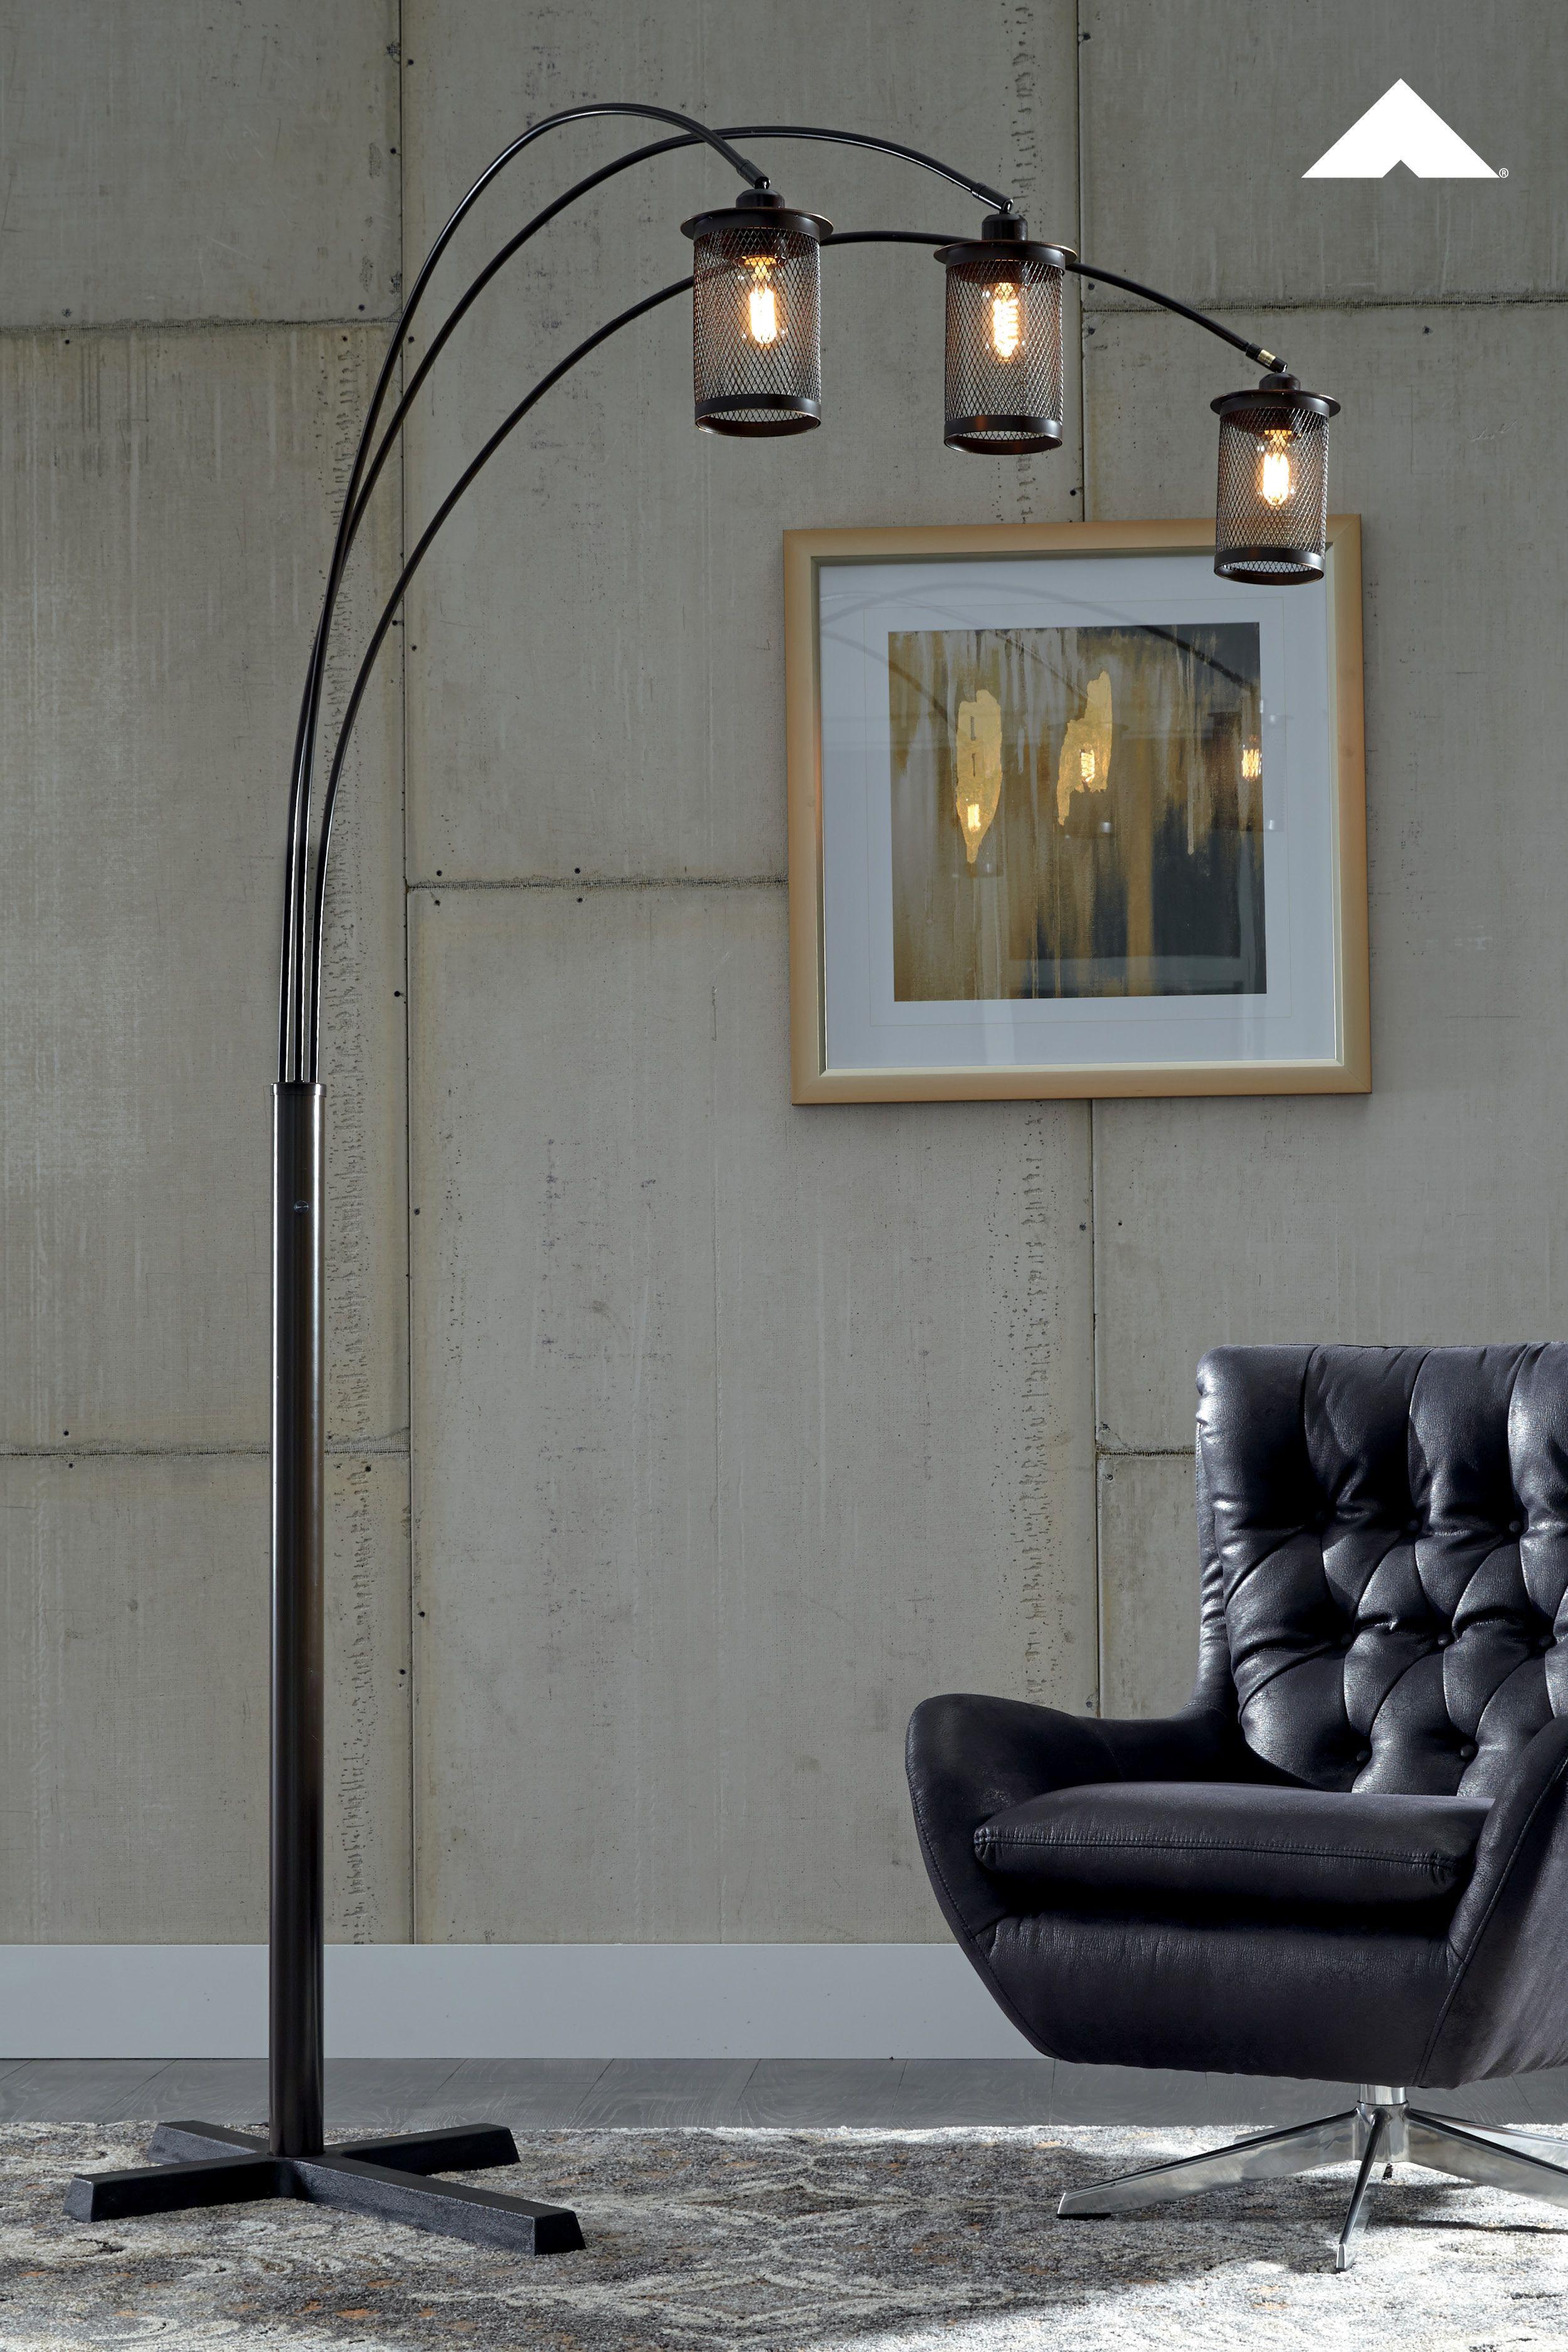 Maovesa Bronze Metal Arc Lamp The Maovesa Floor Lamp Impresses